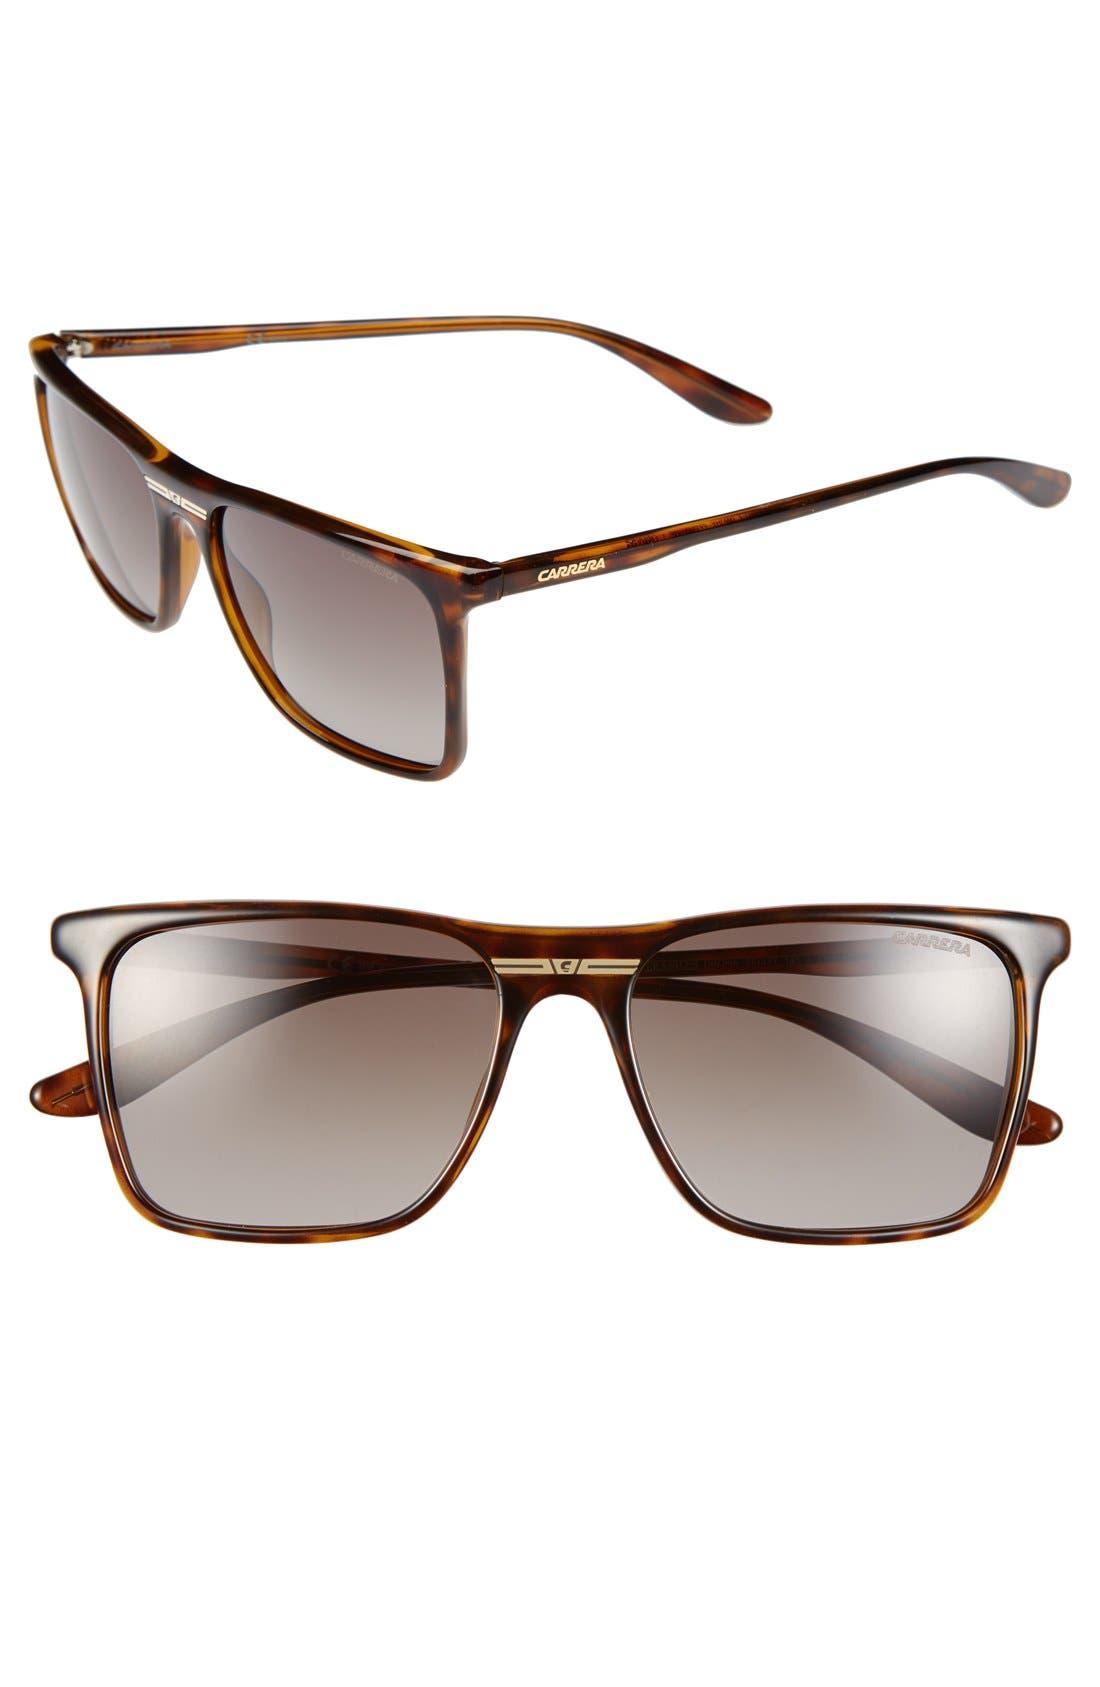 Main Image - Carrera Eyewear 55mm Retro Sunglasses